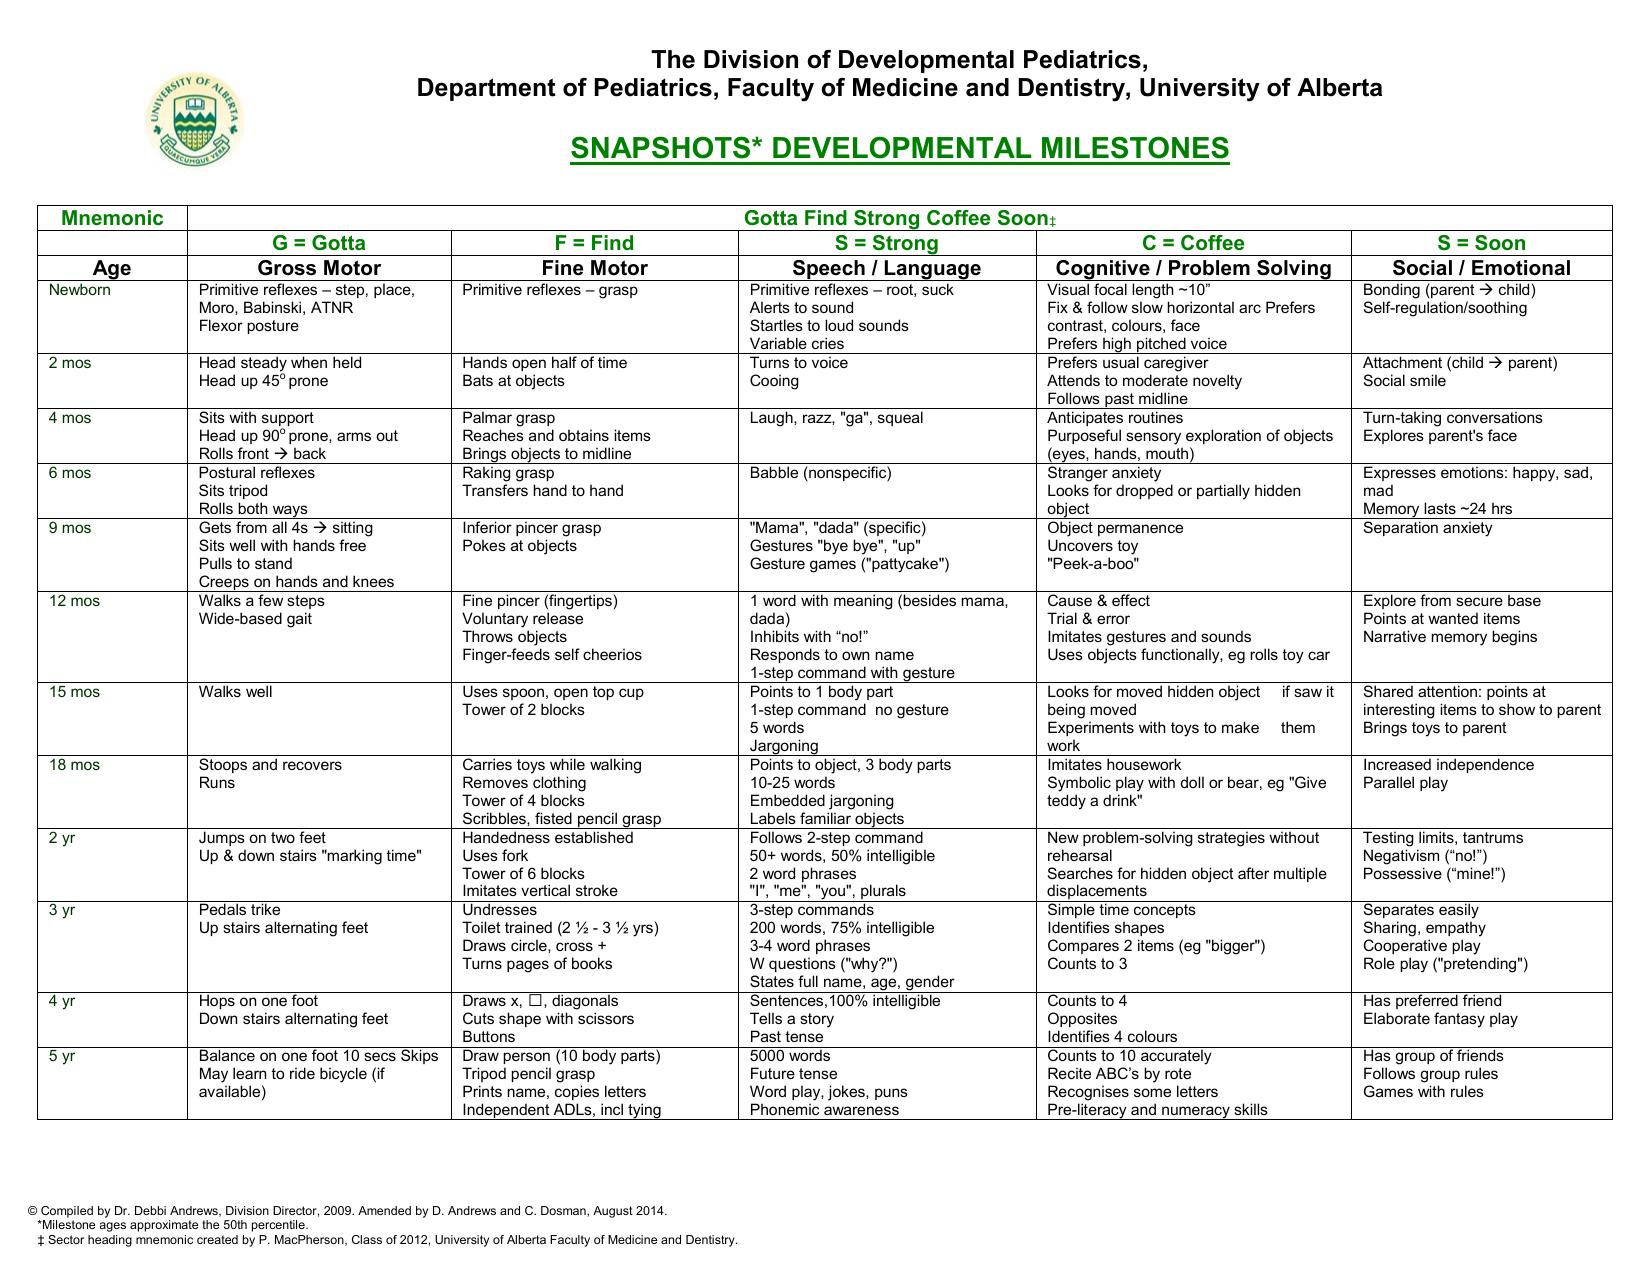 Developmental Milestones Reference Chart1